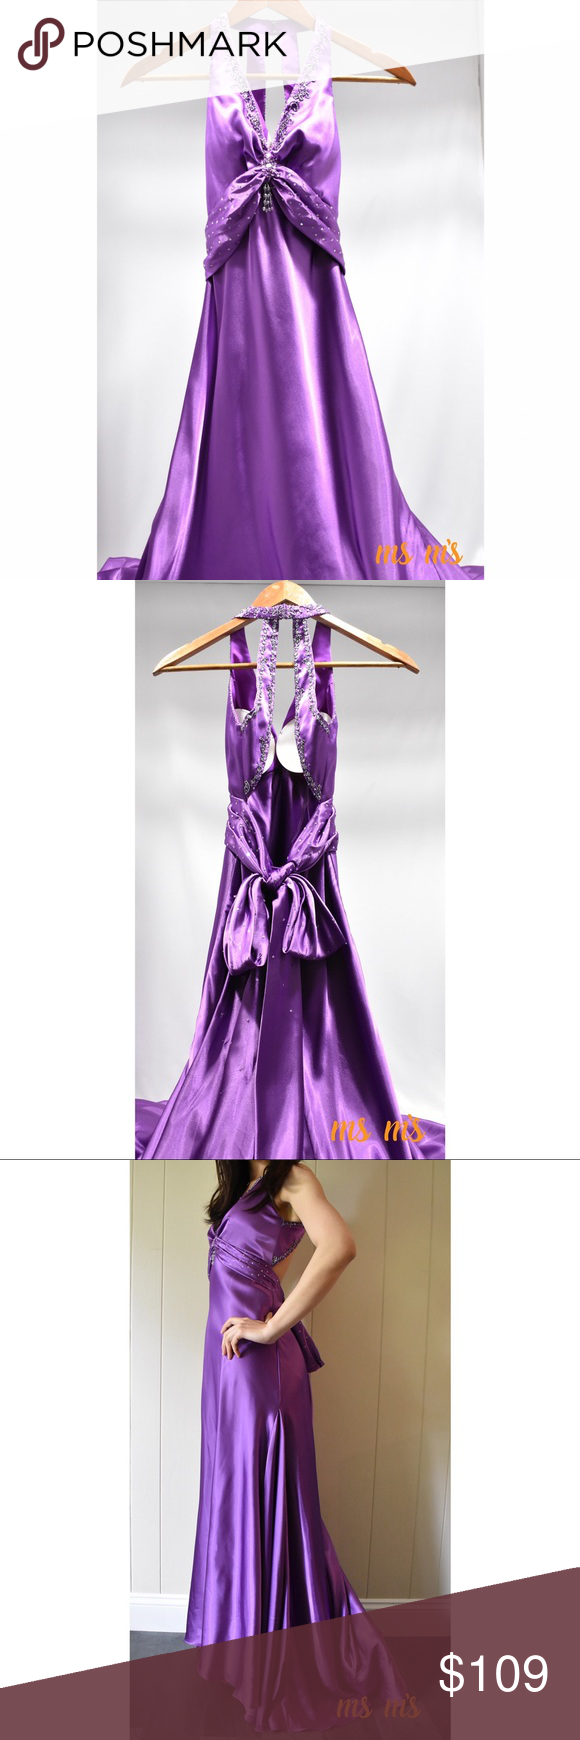 MoriLee by Madeline Gardner Porm dress US:1/2 EXCELLENT condition ...